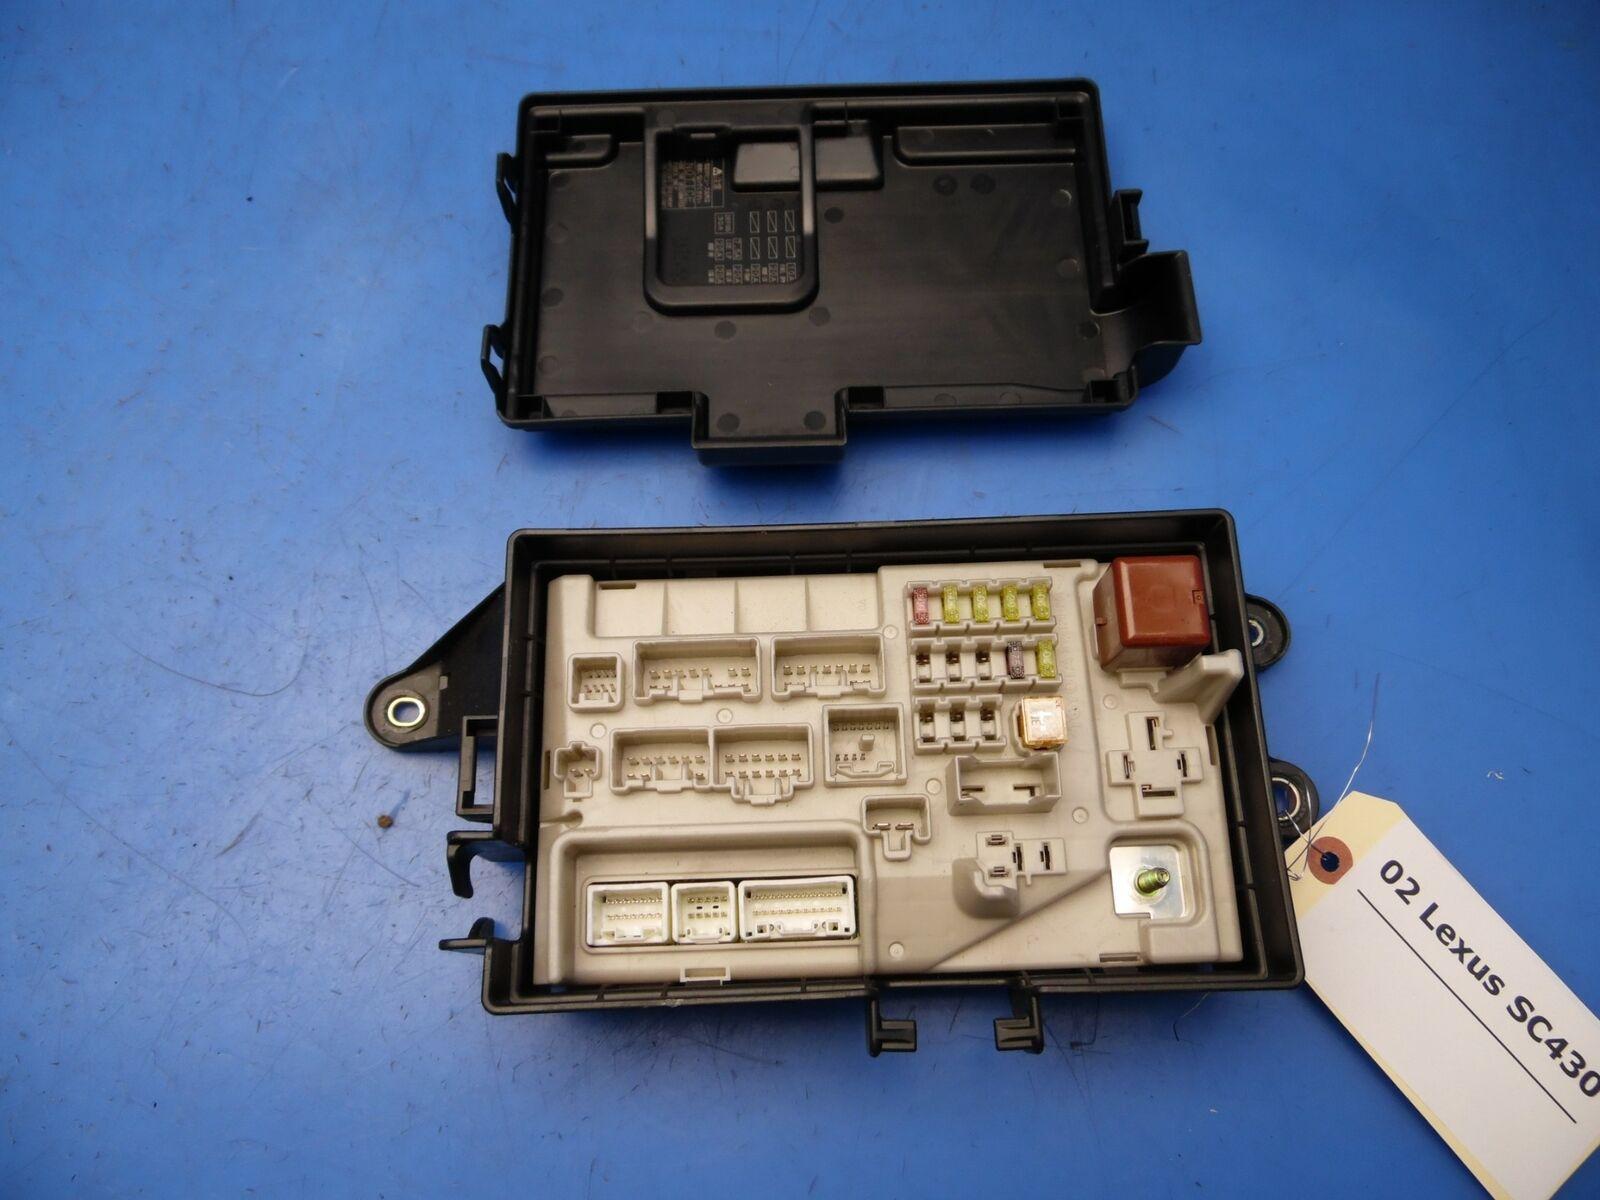 02-05 Lexus SC430 OEM REAR junction fuse box w/ fuses & relays #  82670-24090 for sale onlineeBay